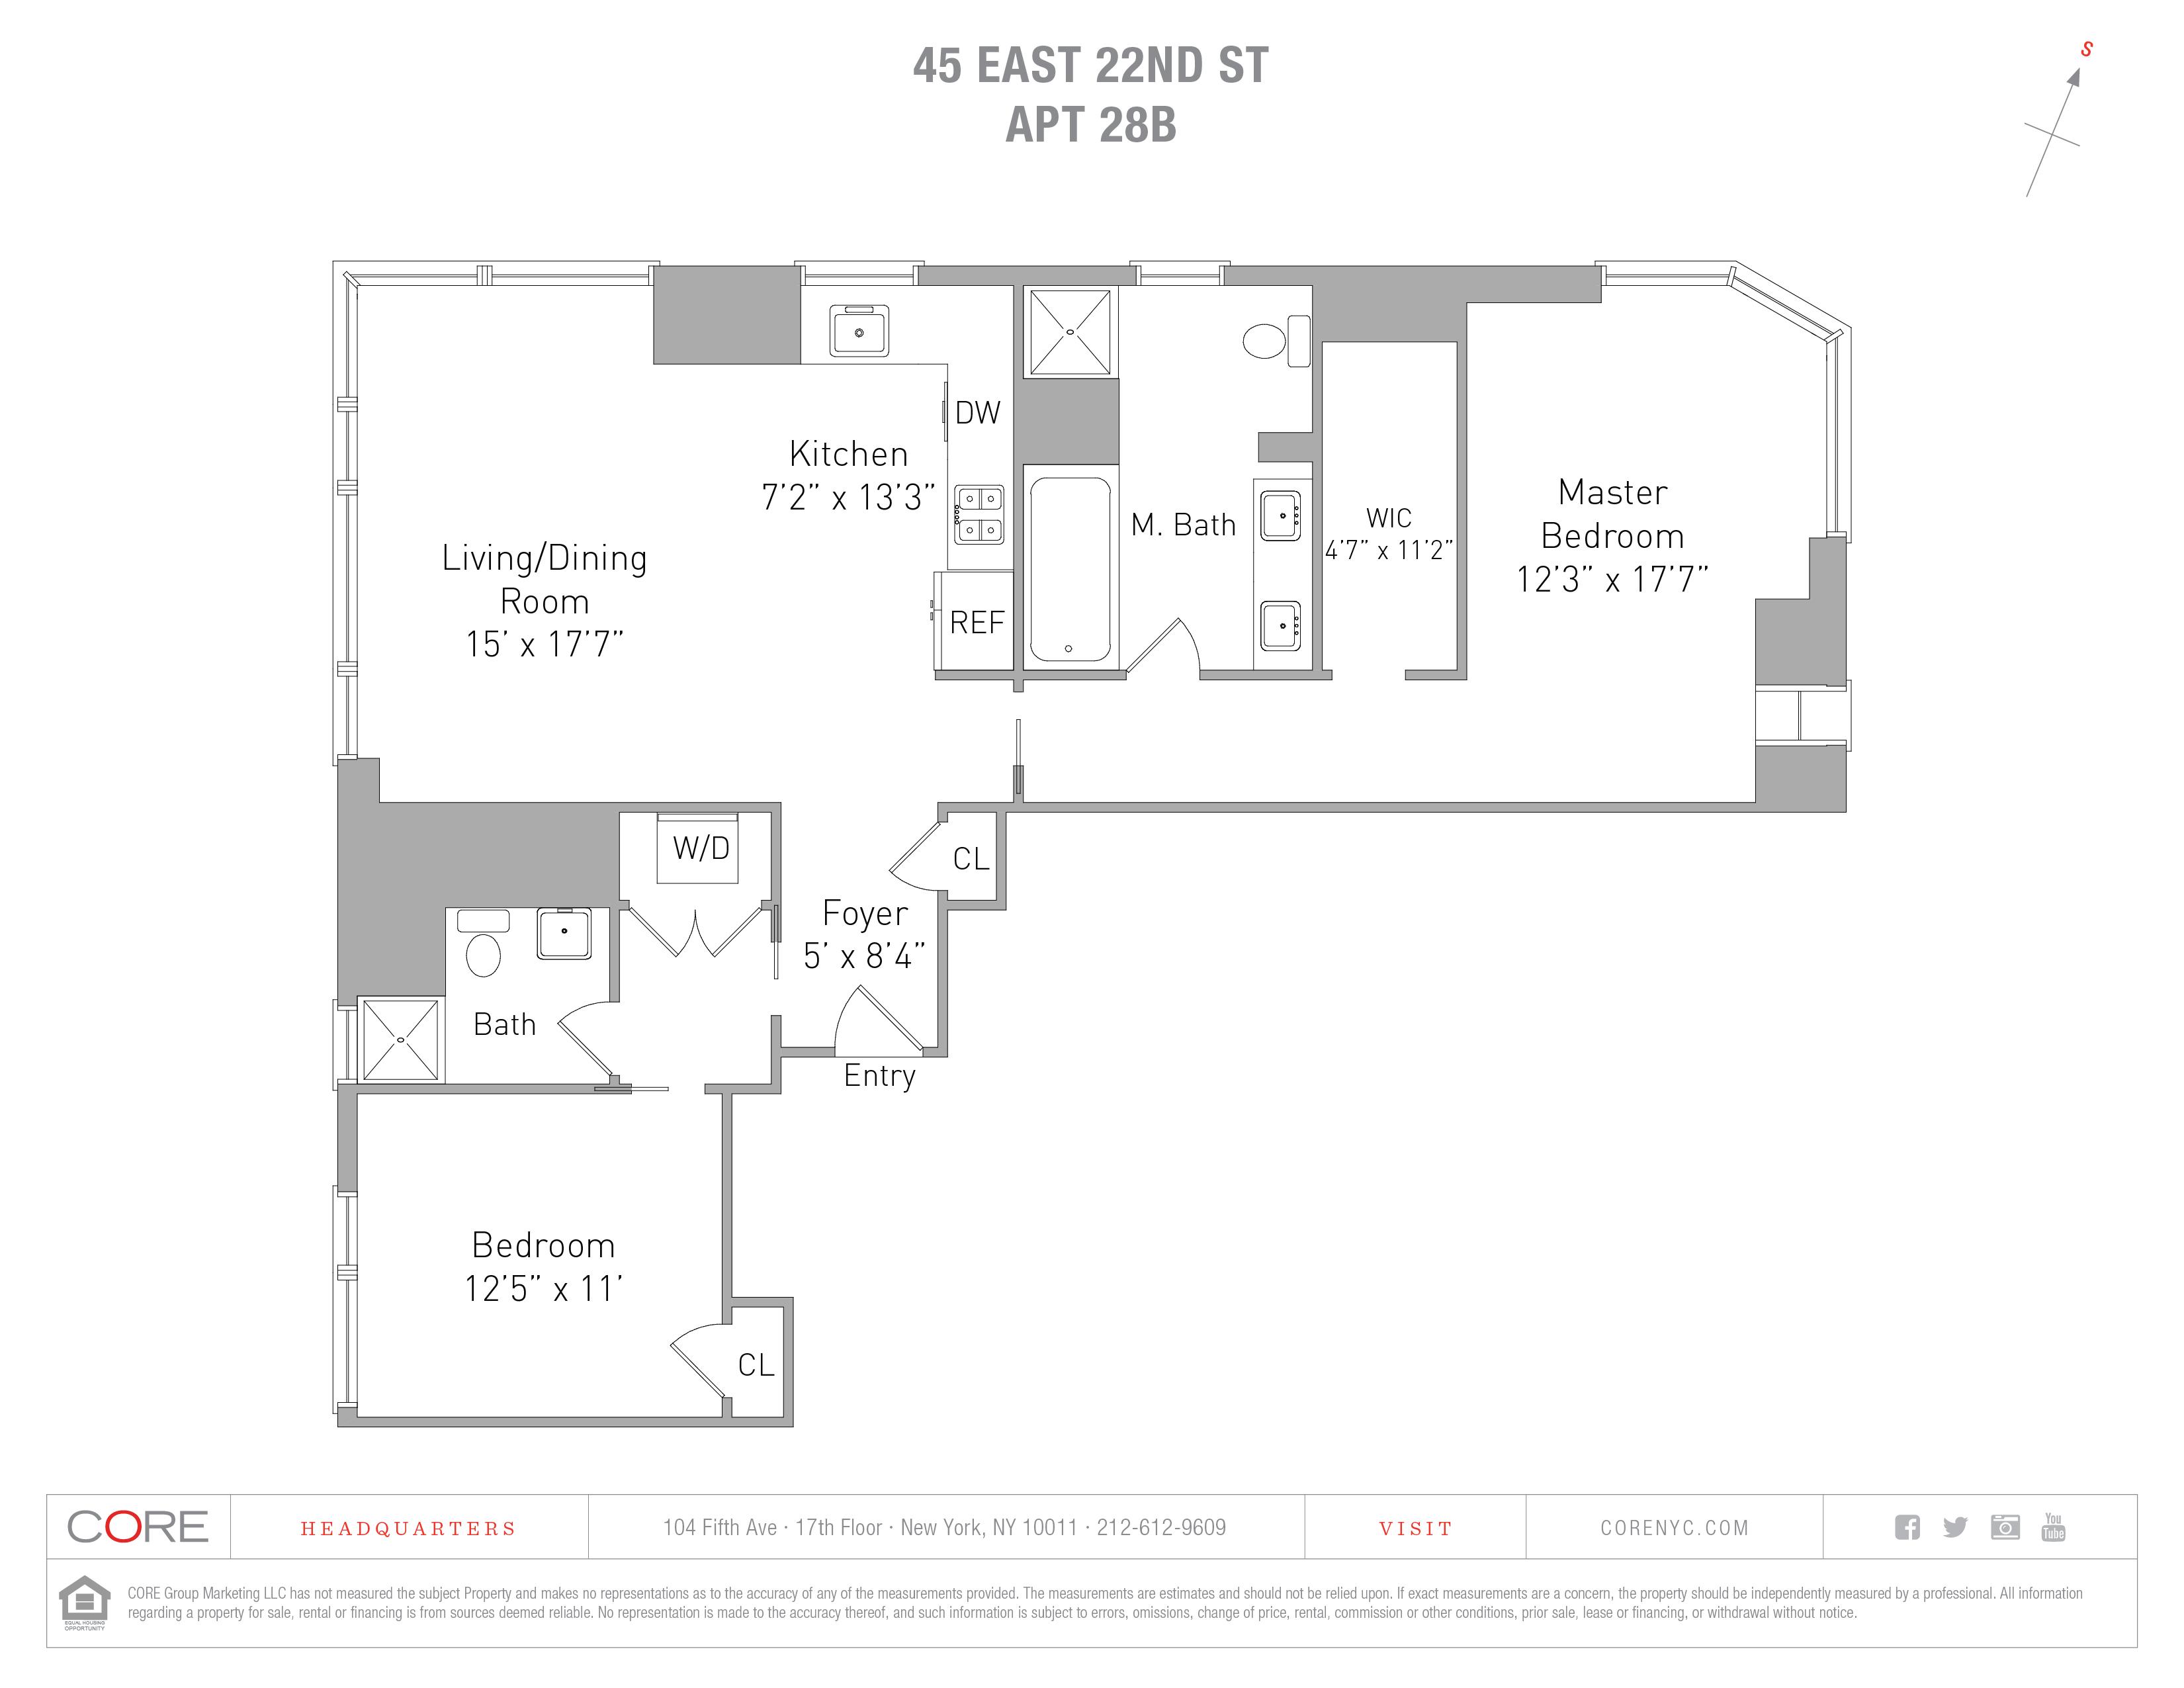 45 East 22nd St. 28B, New York, NY 10010